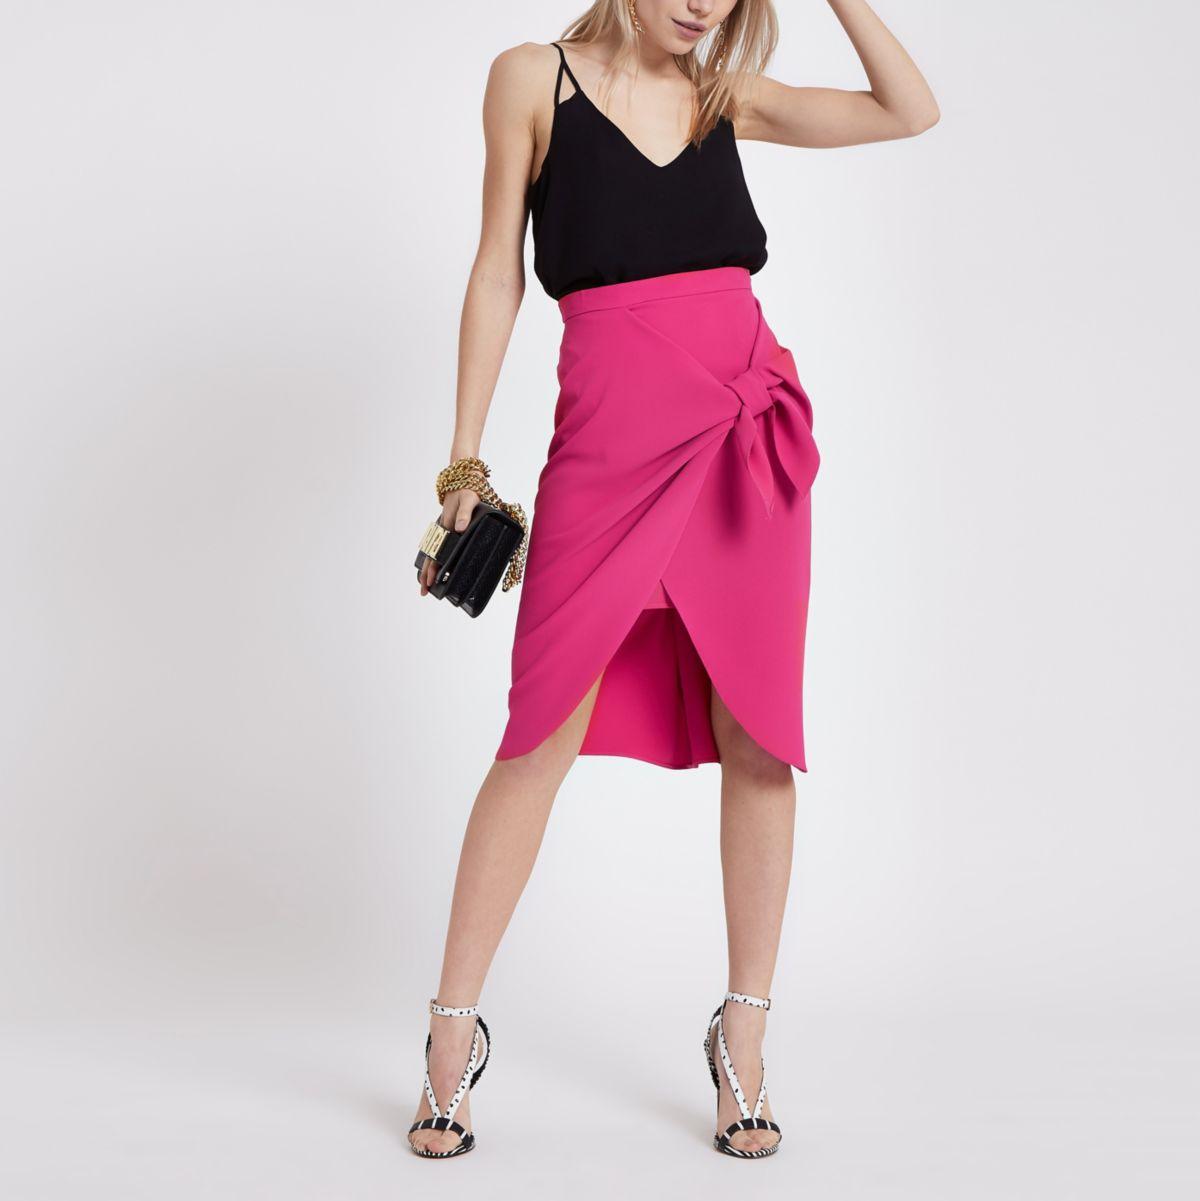 Petite pink tie front pencil skirt